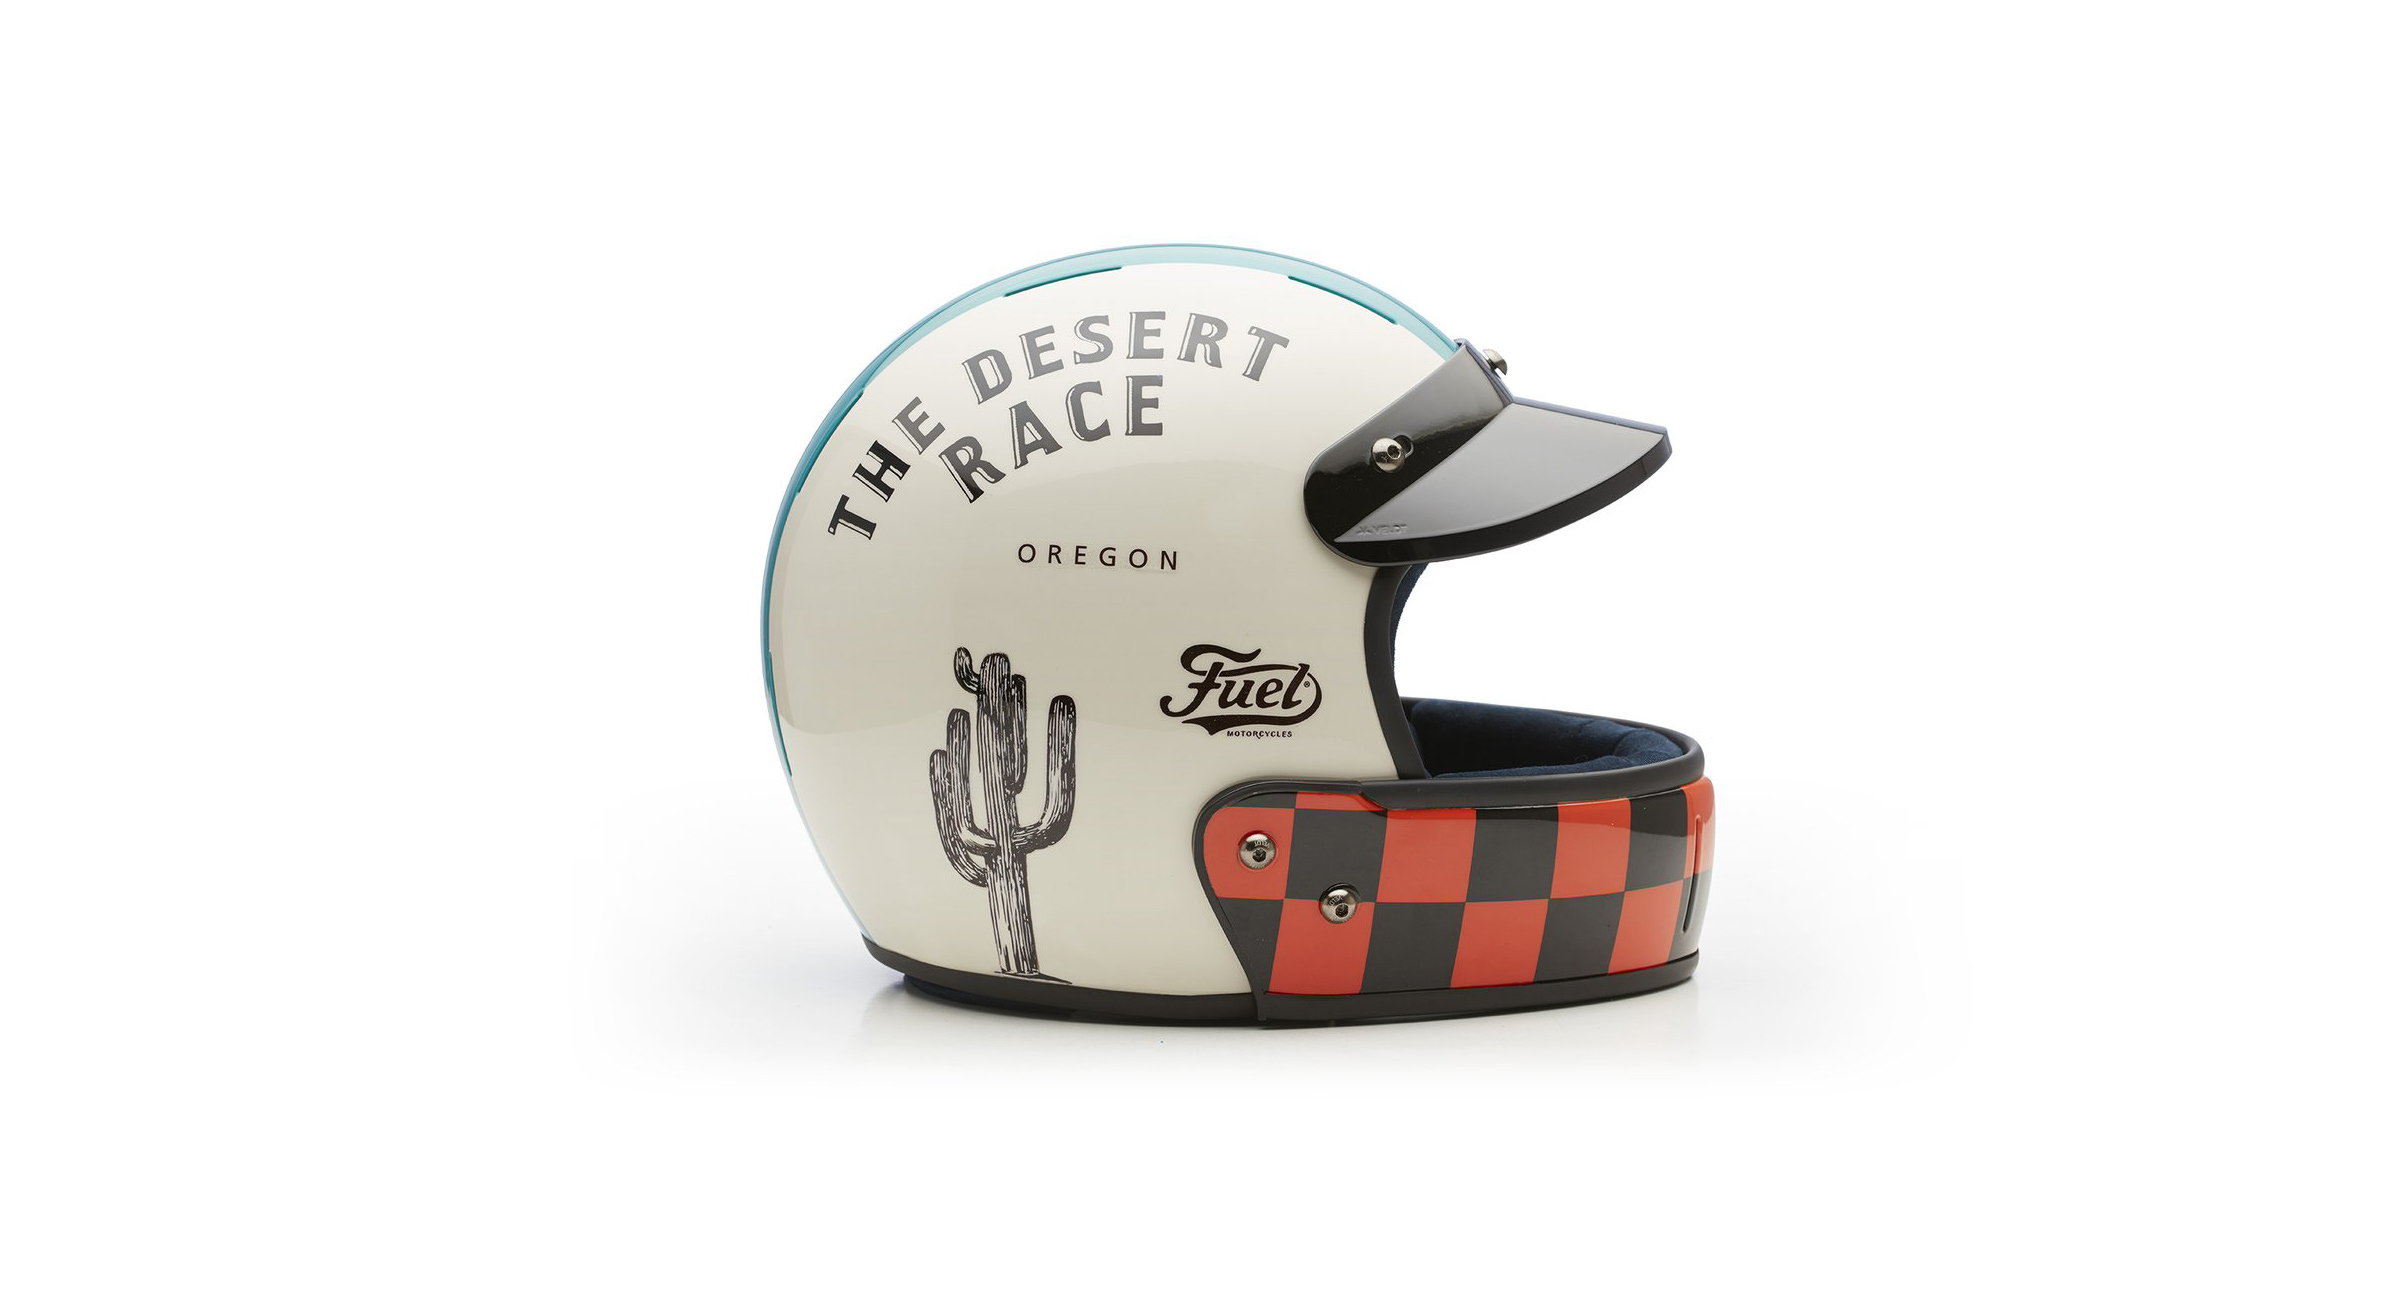 Veldt Desert Race x Fuel Motorcycles Limited Edition Helmet